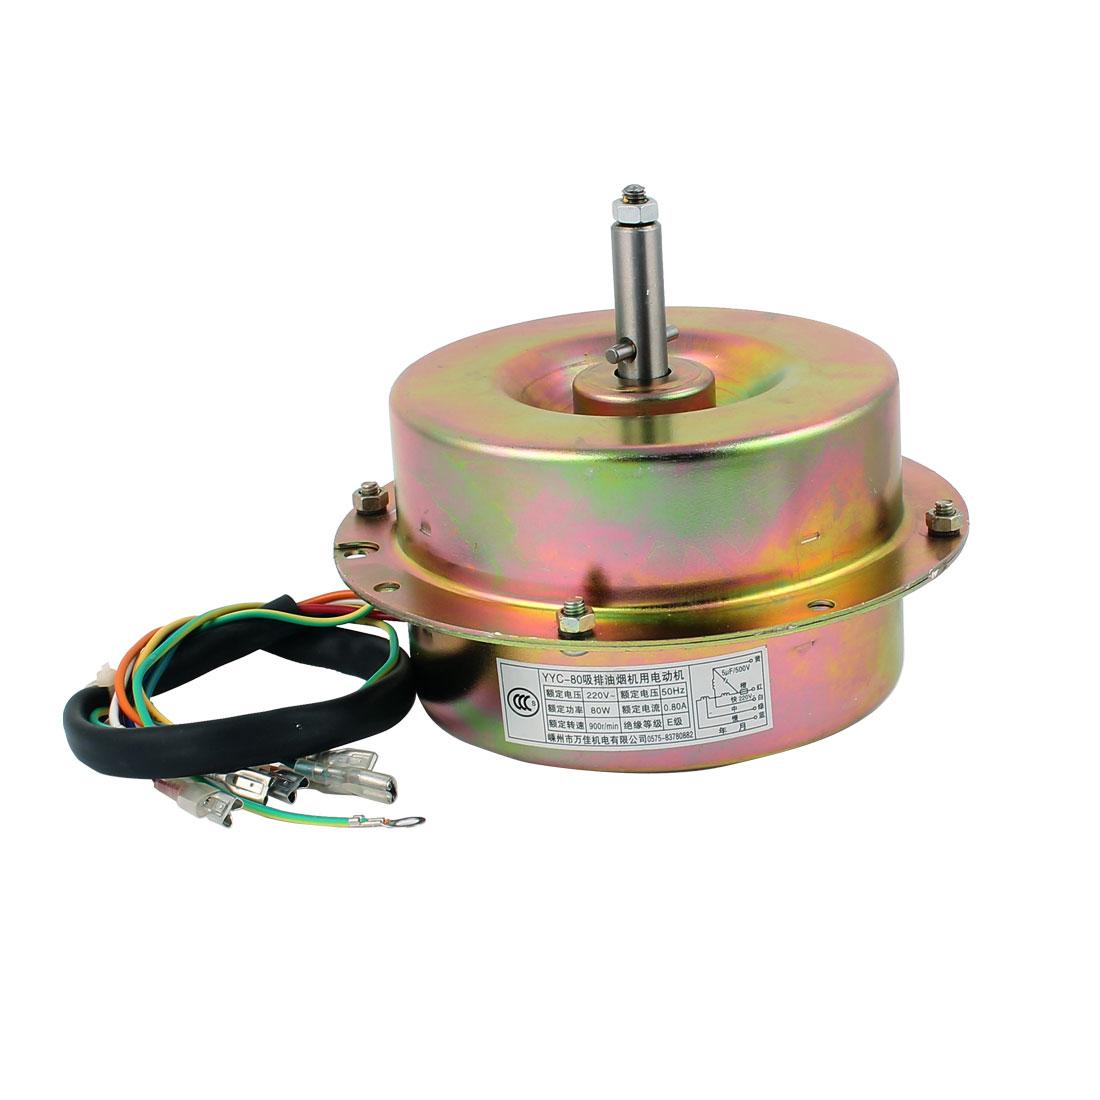 AC 220V 0.8A 80W 900RPM 12mm x 40mm Shaft Dual Bearing Ball Electric Ventilator Fan Motor